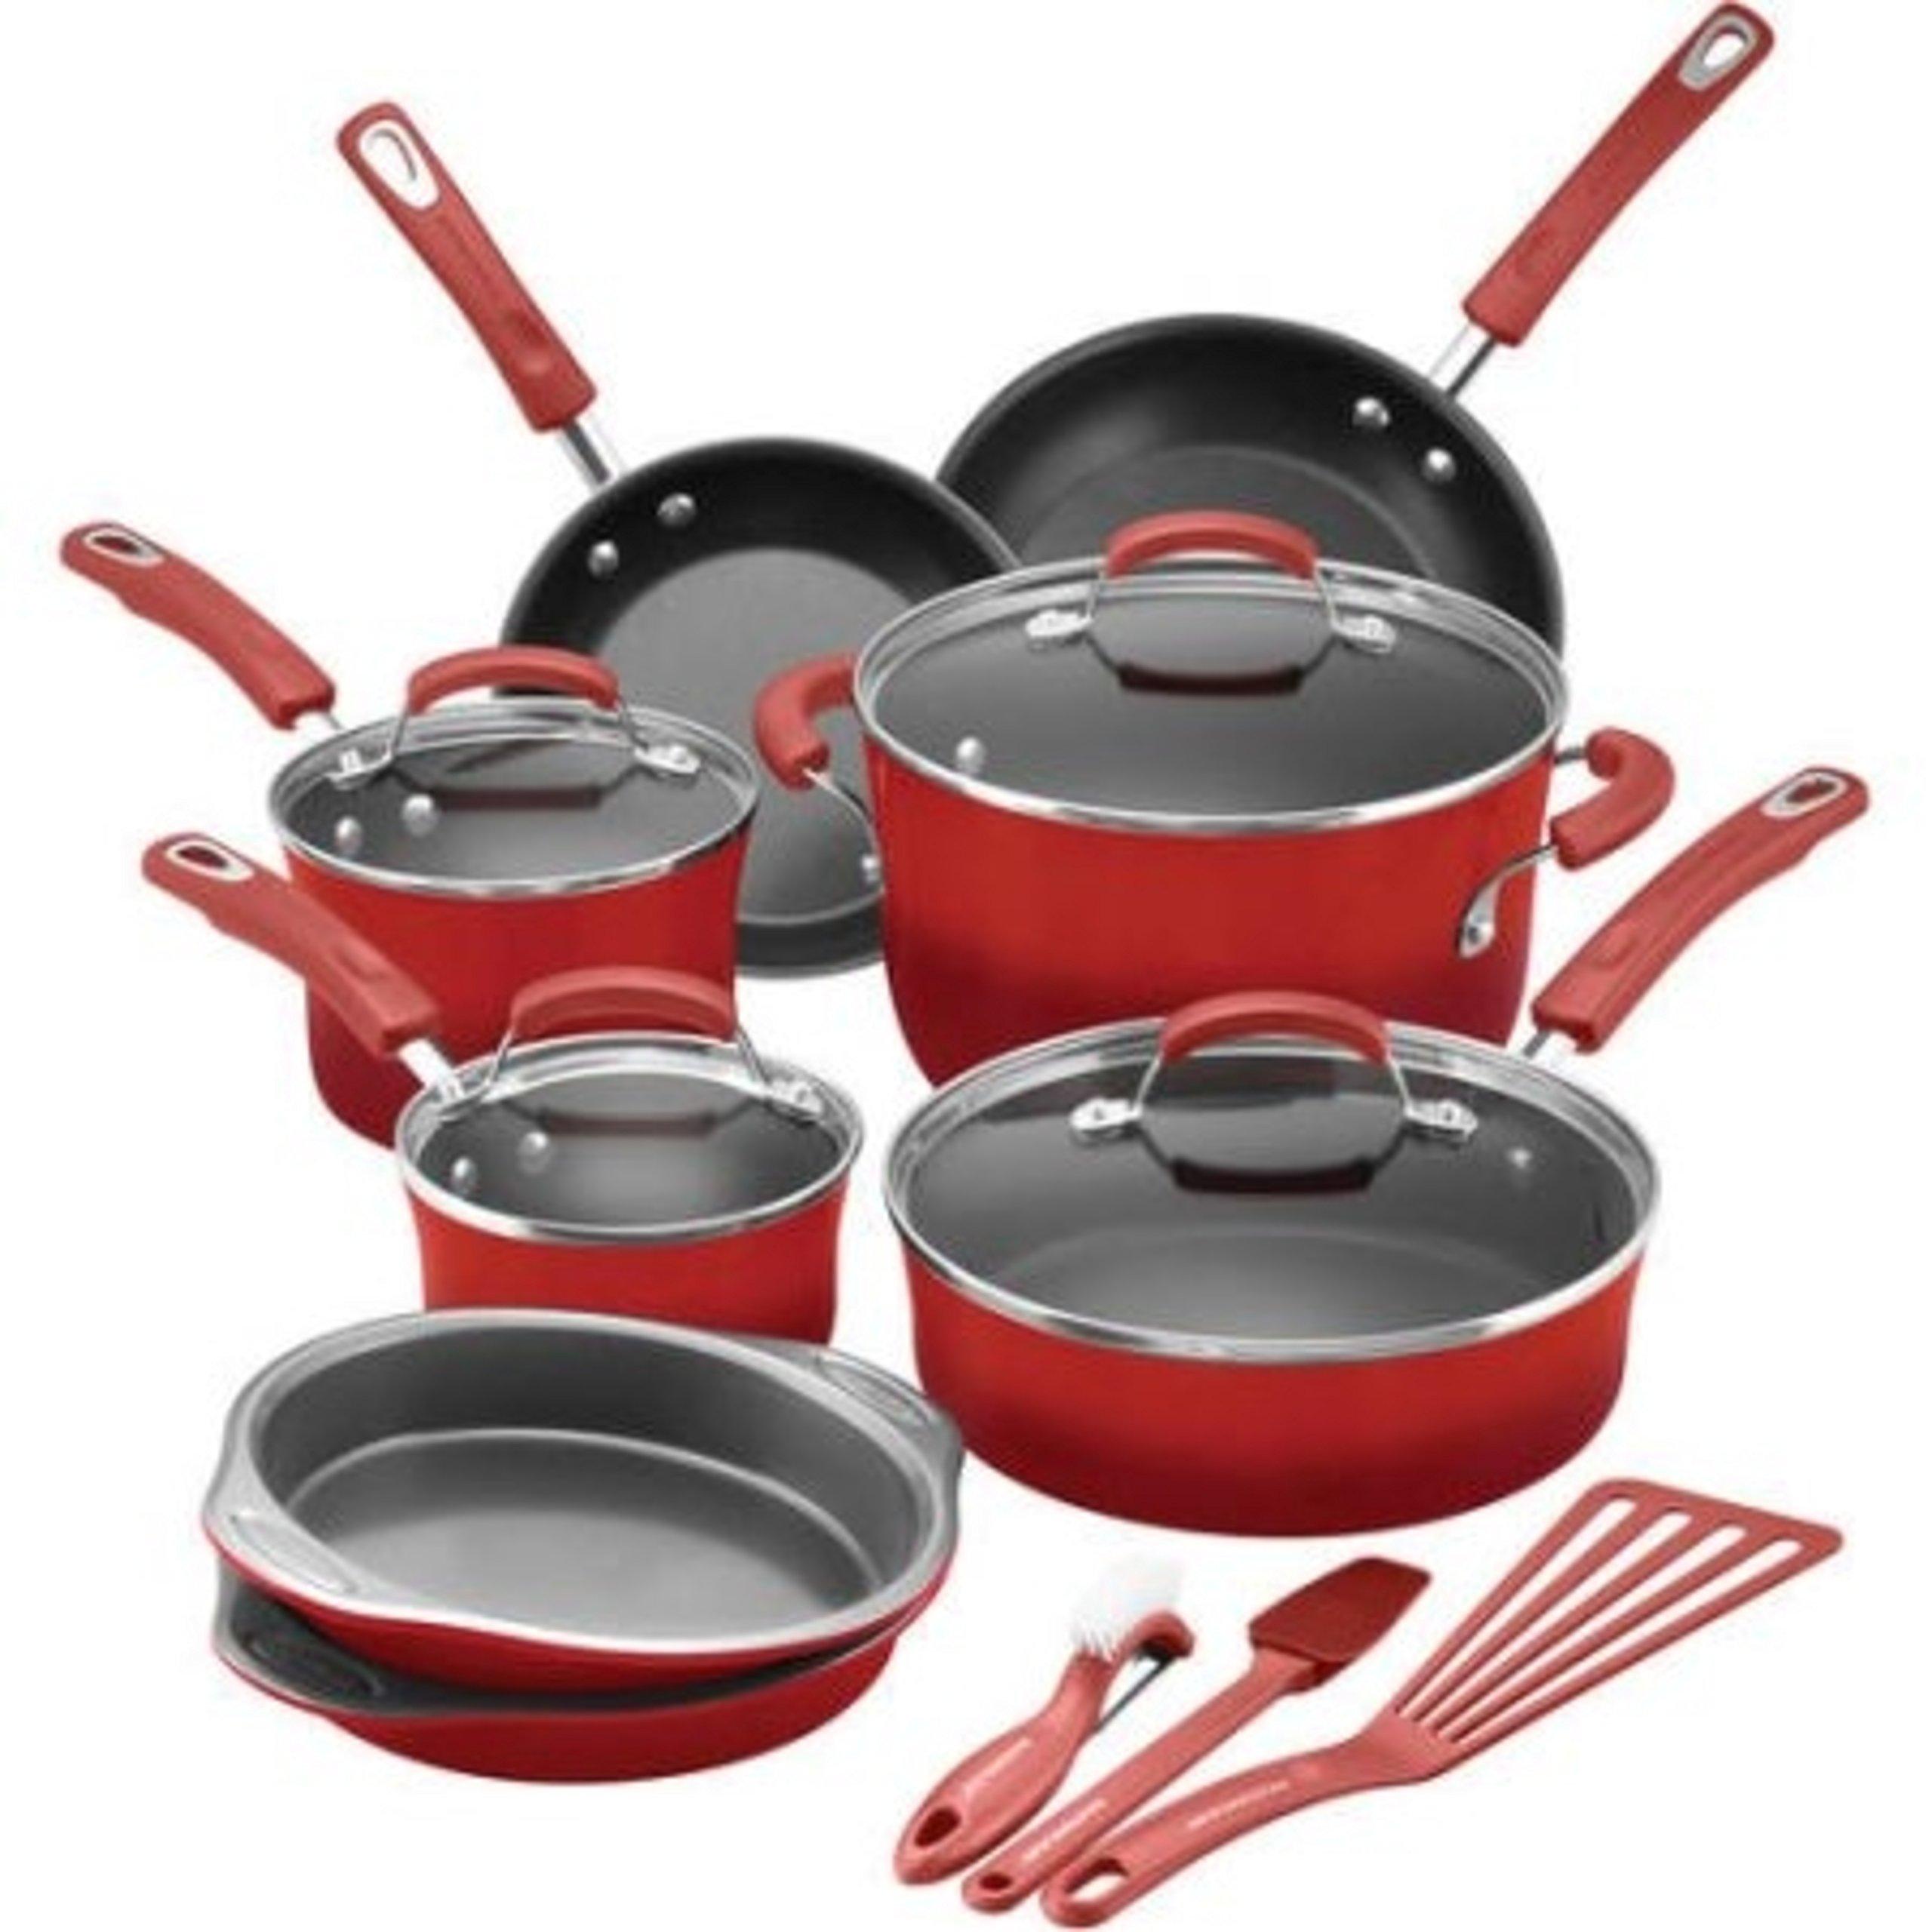 15-Piece Durable Aluminum Construction Shatter Resistant Red Nonstick Cookware Set